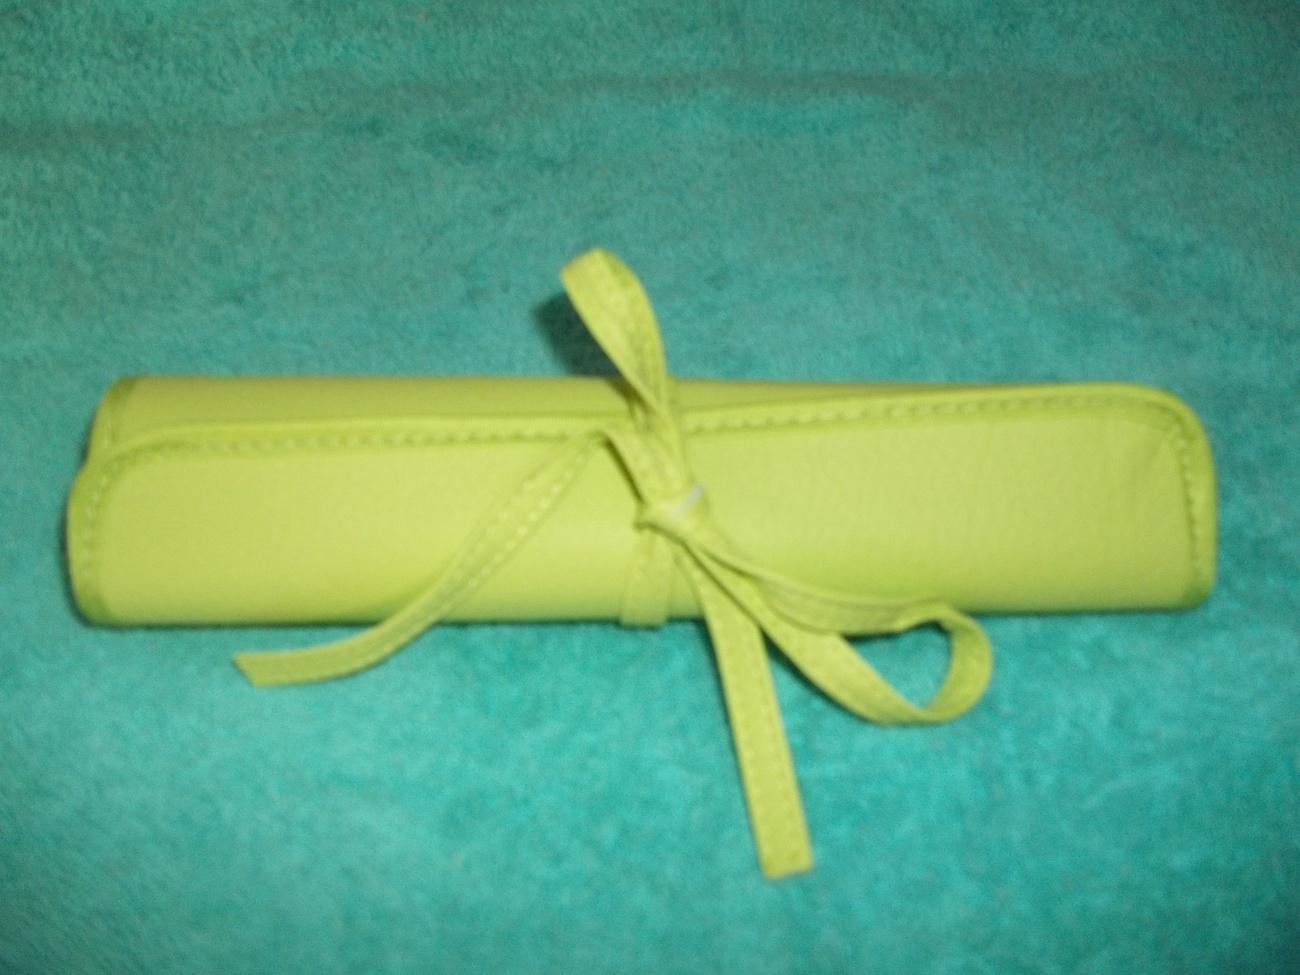 6 Brush Sets: Powder, Blush, Eyeshadow, Lipstick, Eyebrow, Eyeliner + Green Bag